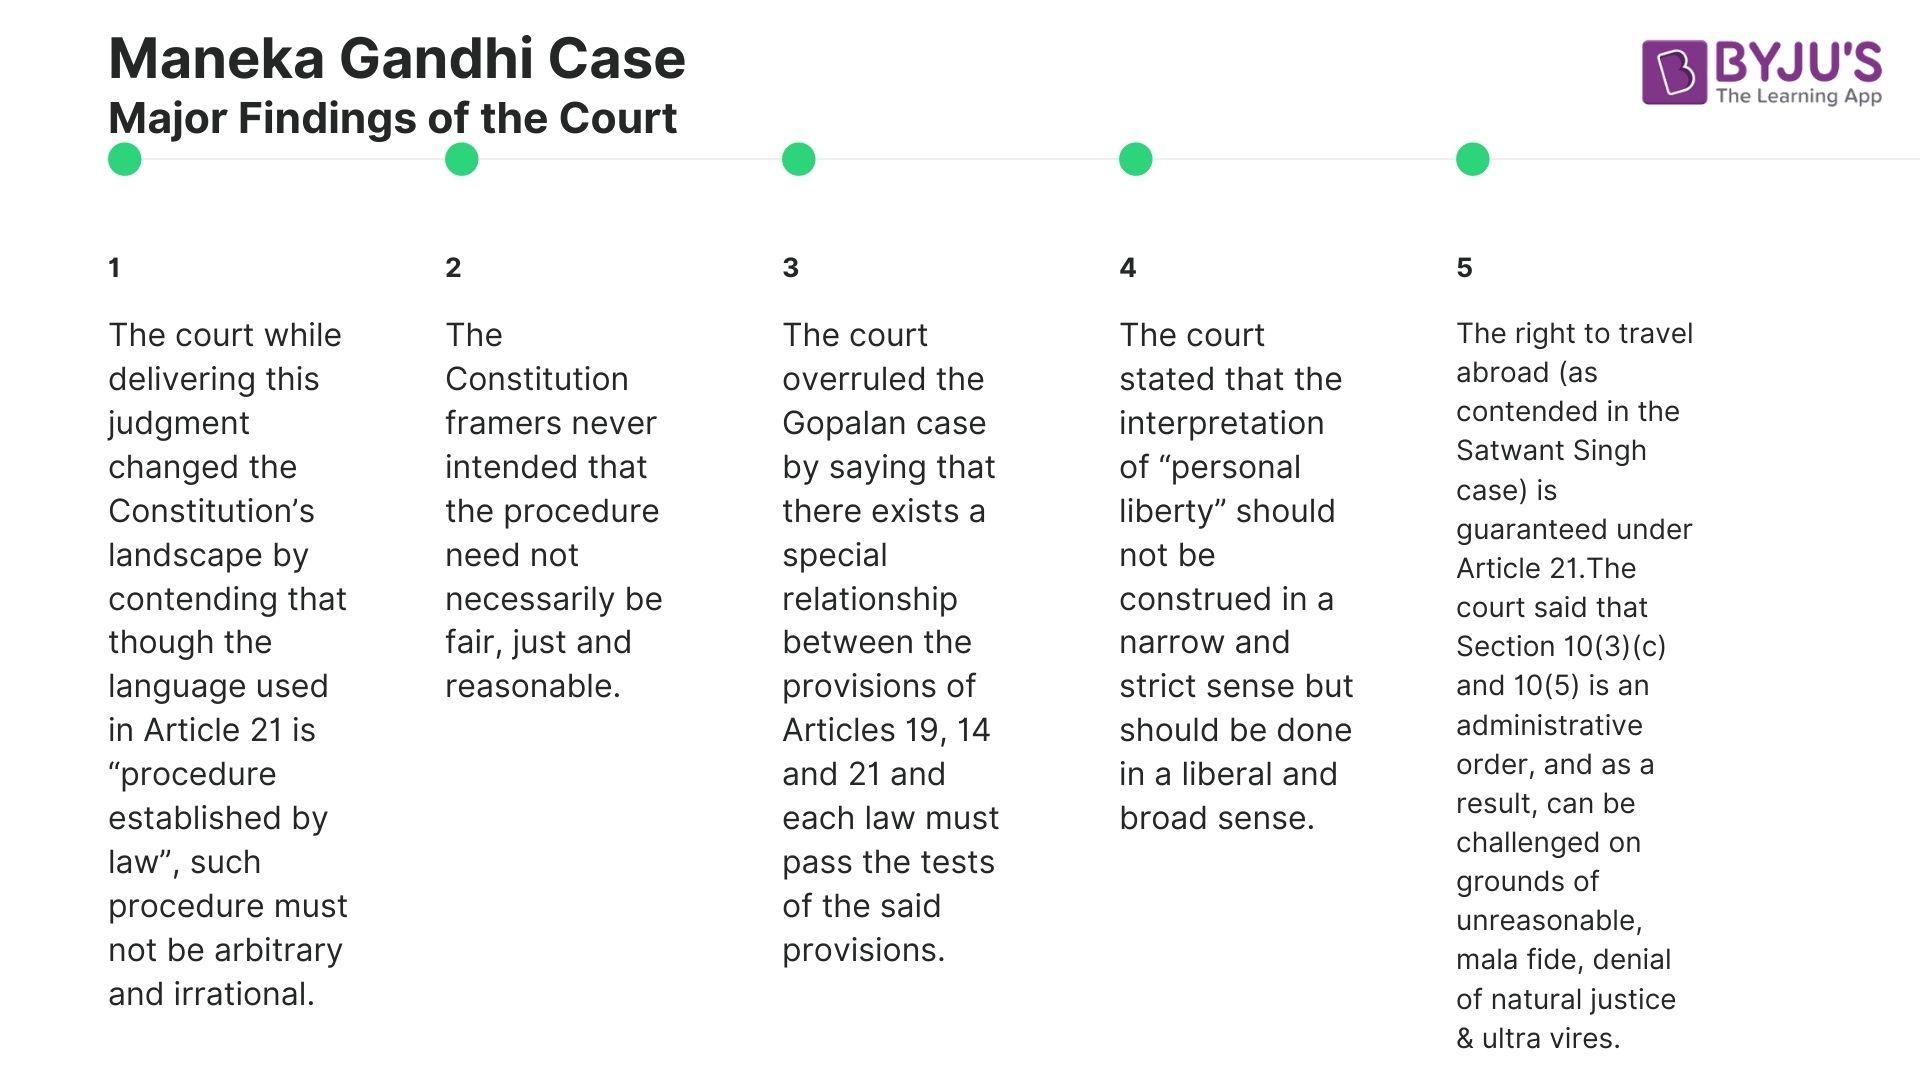 Maneka Gandhi Case - Major Findings of the Court